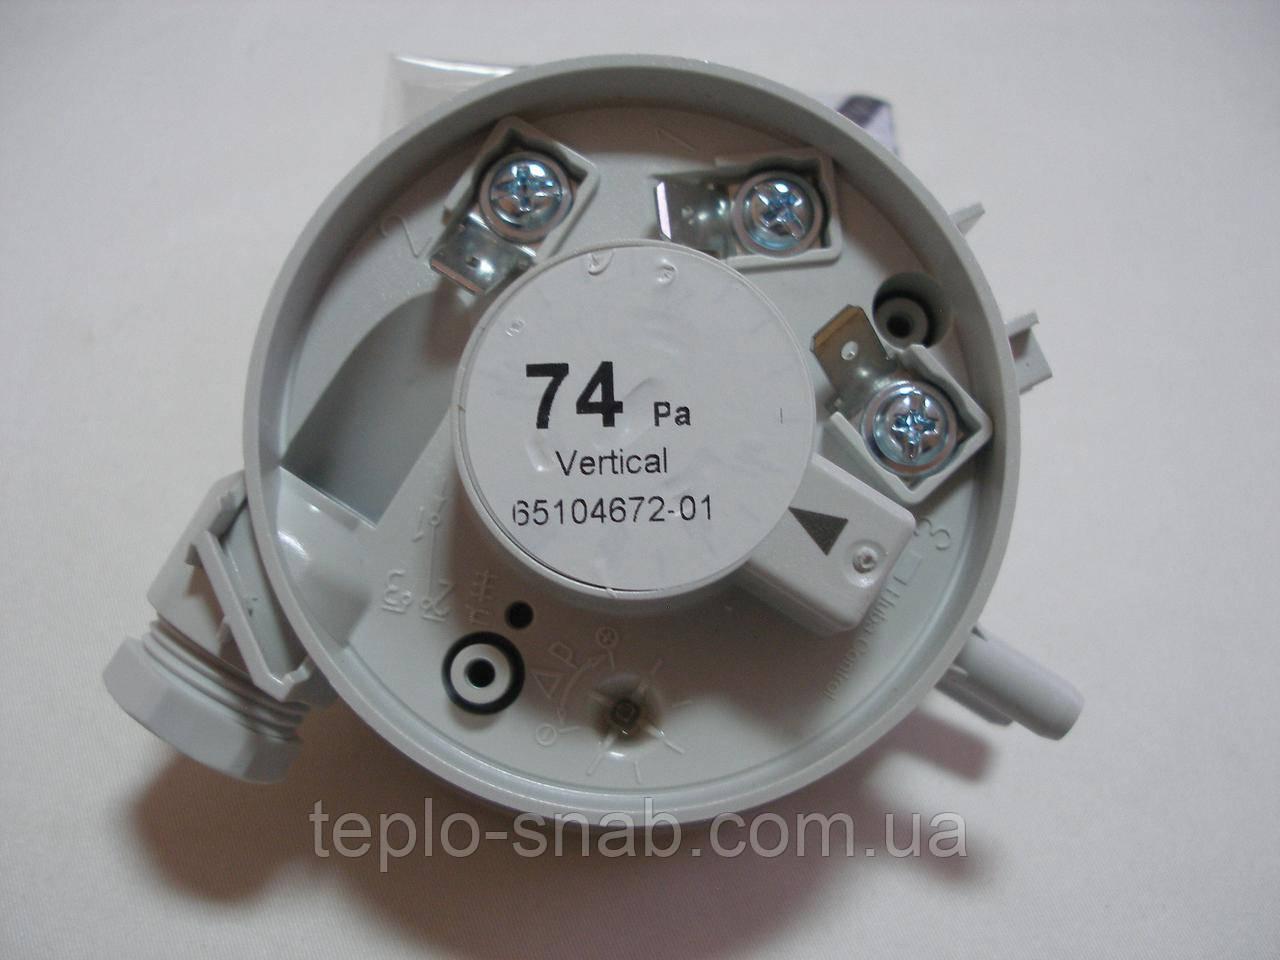 Прессостат 74 Ра Ariston Class 28,35. Genus 28, 35. Art 65104672